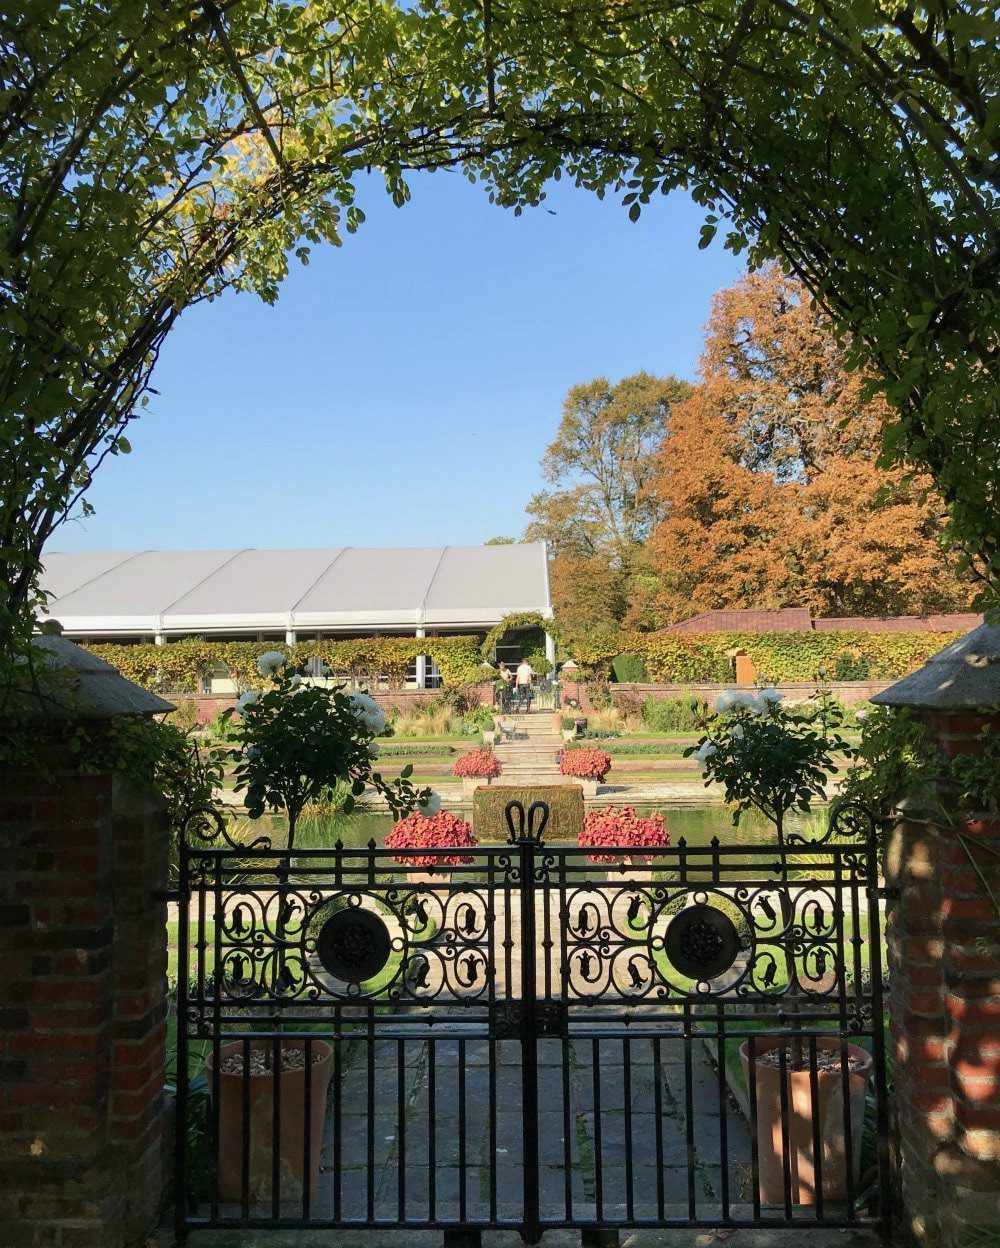 Sunken garden at Kensington Palace, London Photo: Heatheronhertravels.com